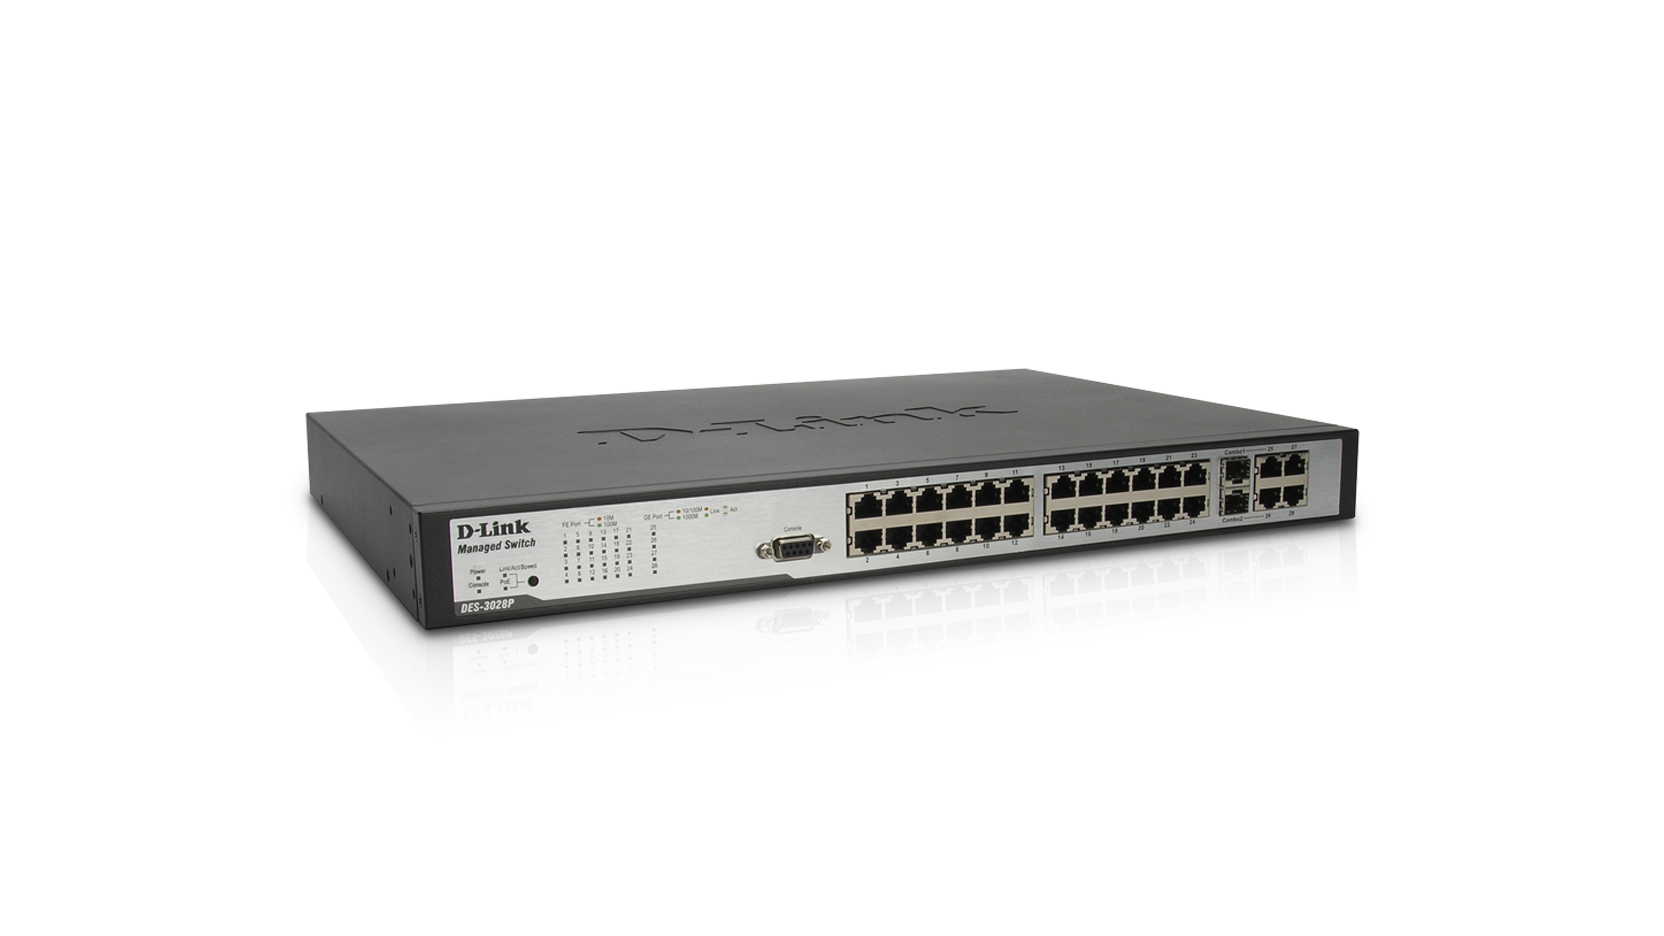 D-Link DES-3028P Fast Ethernet L2+ Switch Driver UPDATE